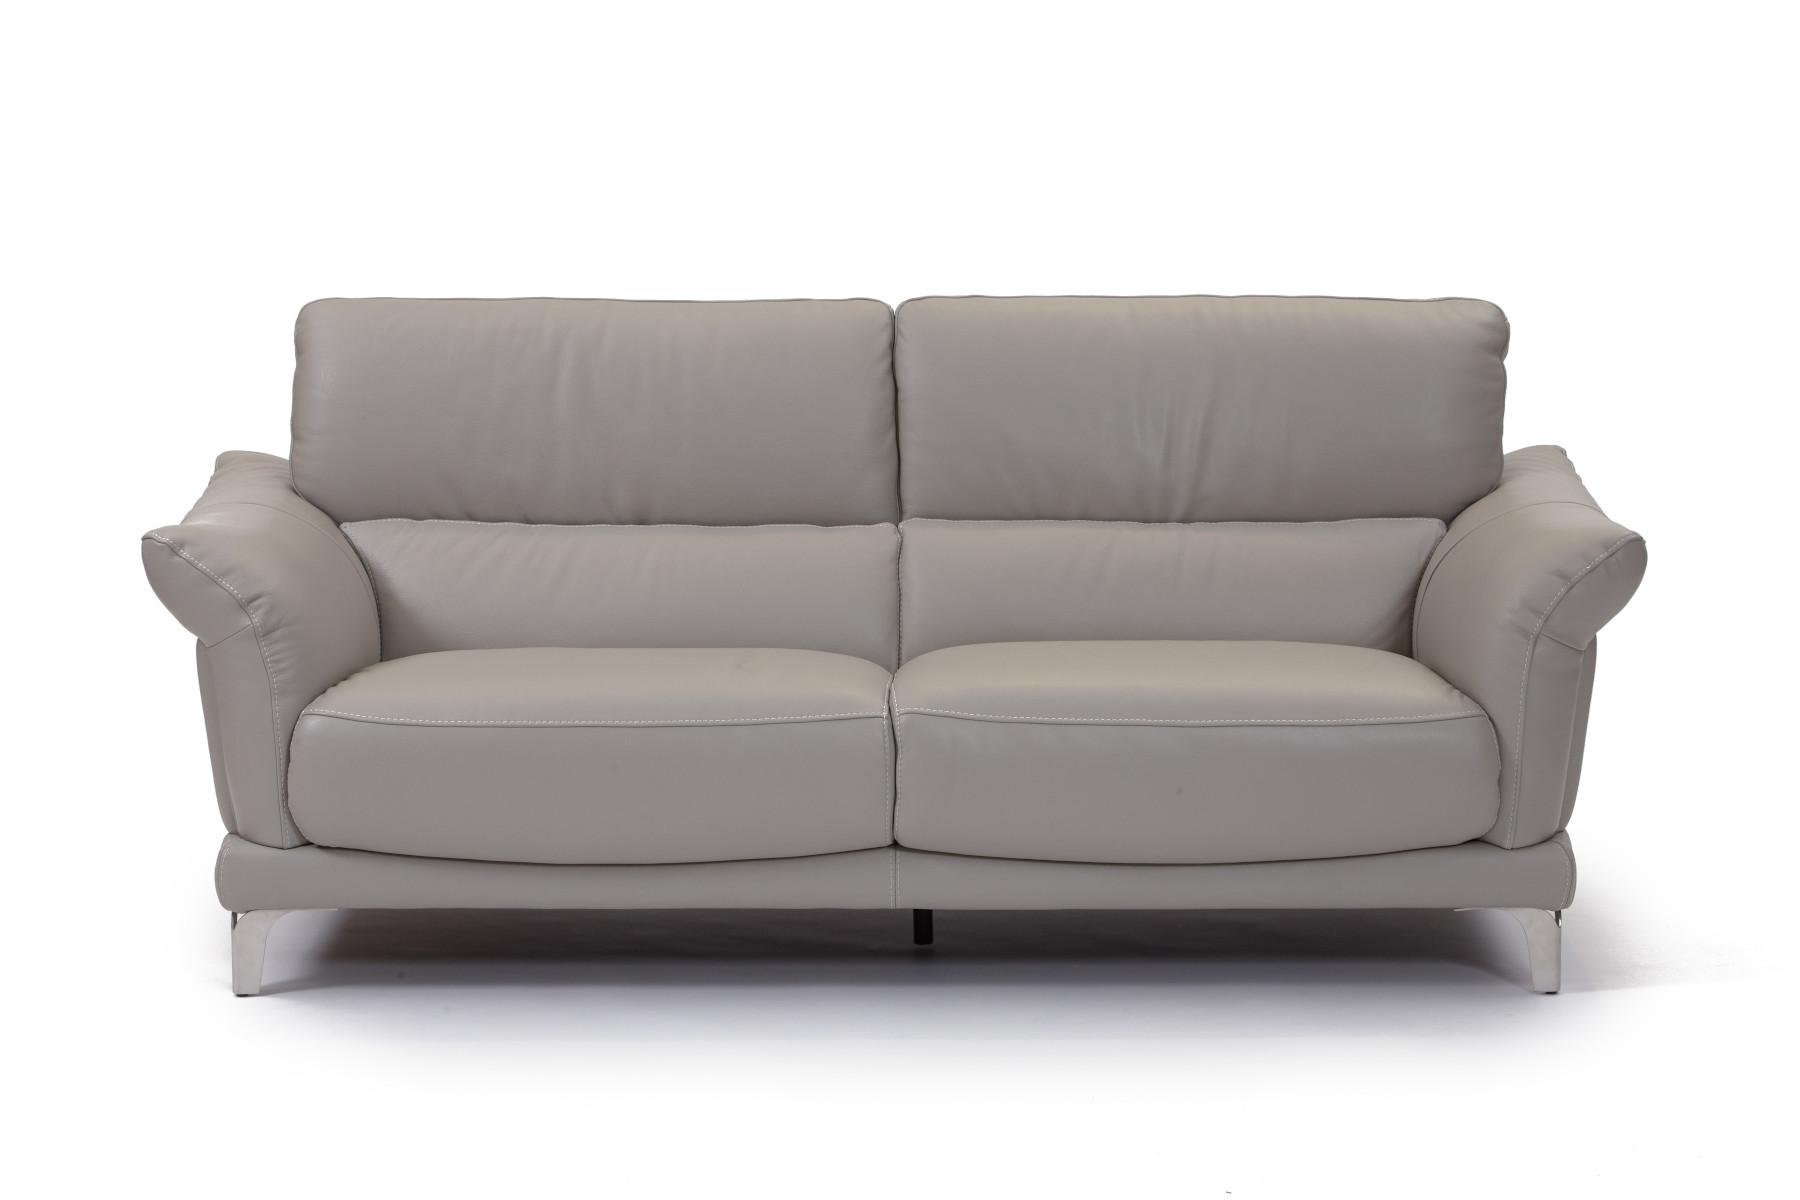 Sierra 3 Seater Sofa